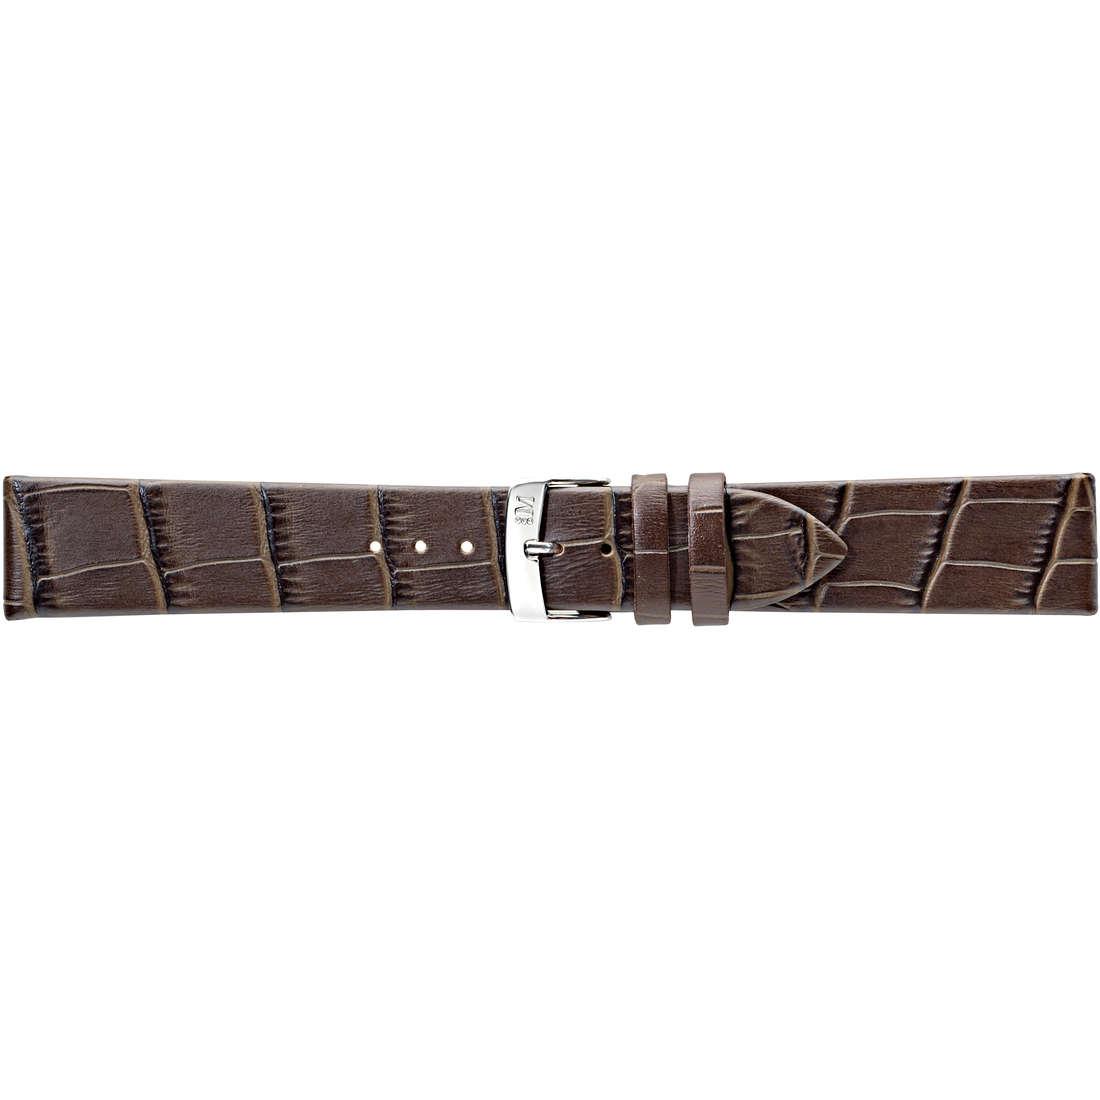 watch watch bands watch straps man Morellato Morellato 1930 A01X4408480032CR20